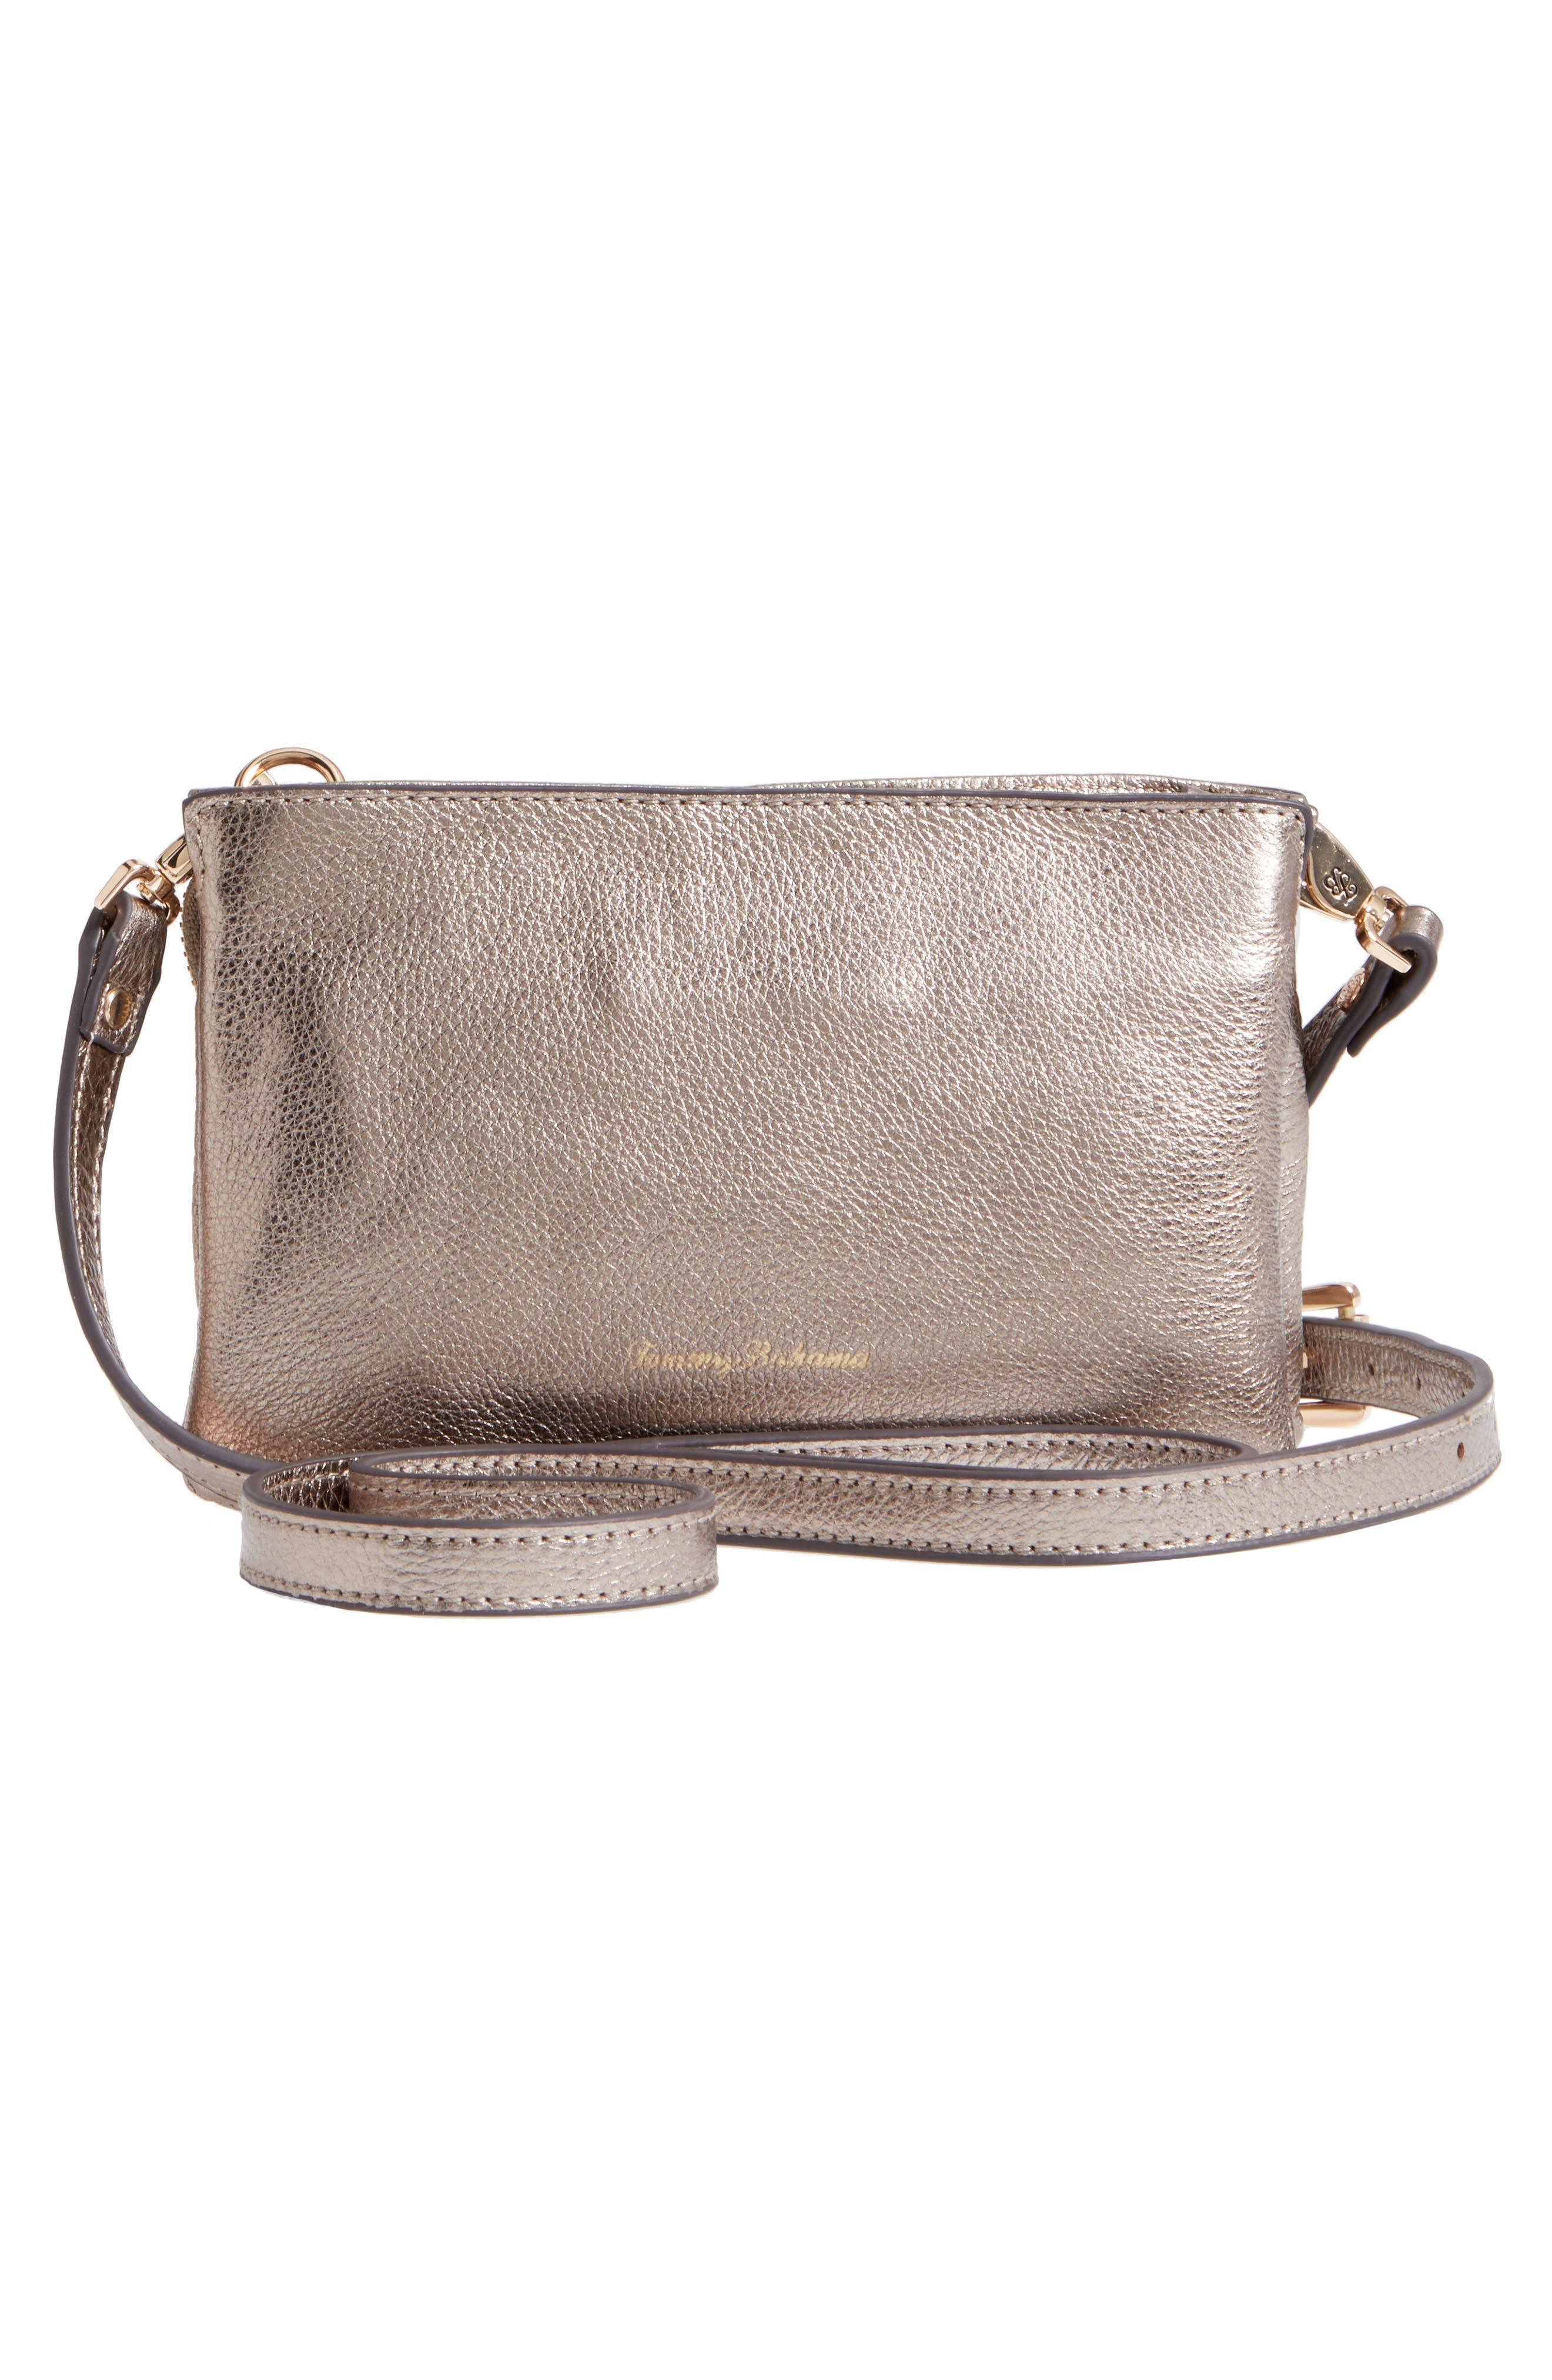 Katerini Leather Crossbody Wallet,                             Alternate thumbnail 17, color,